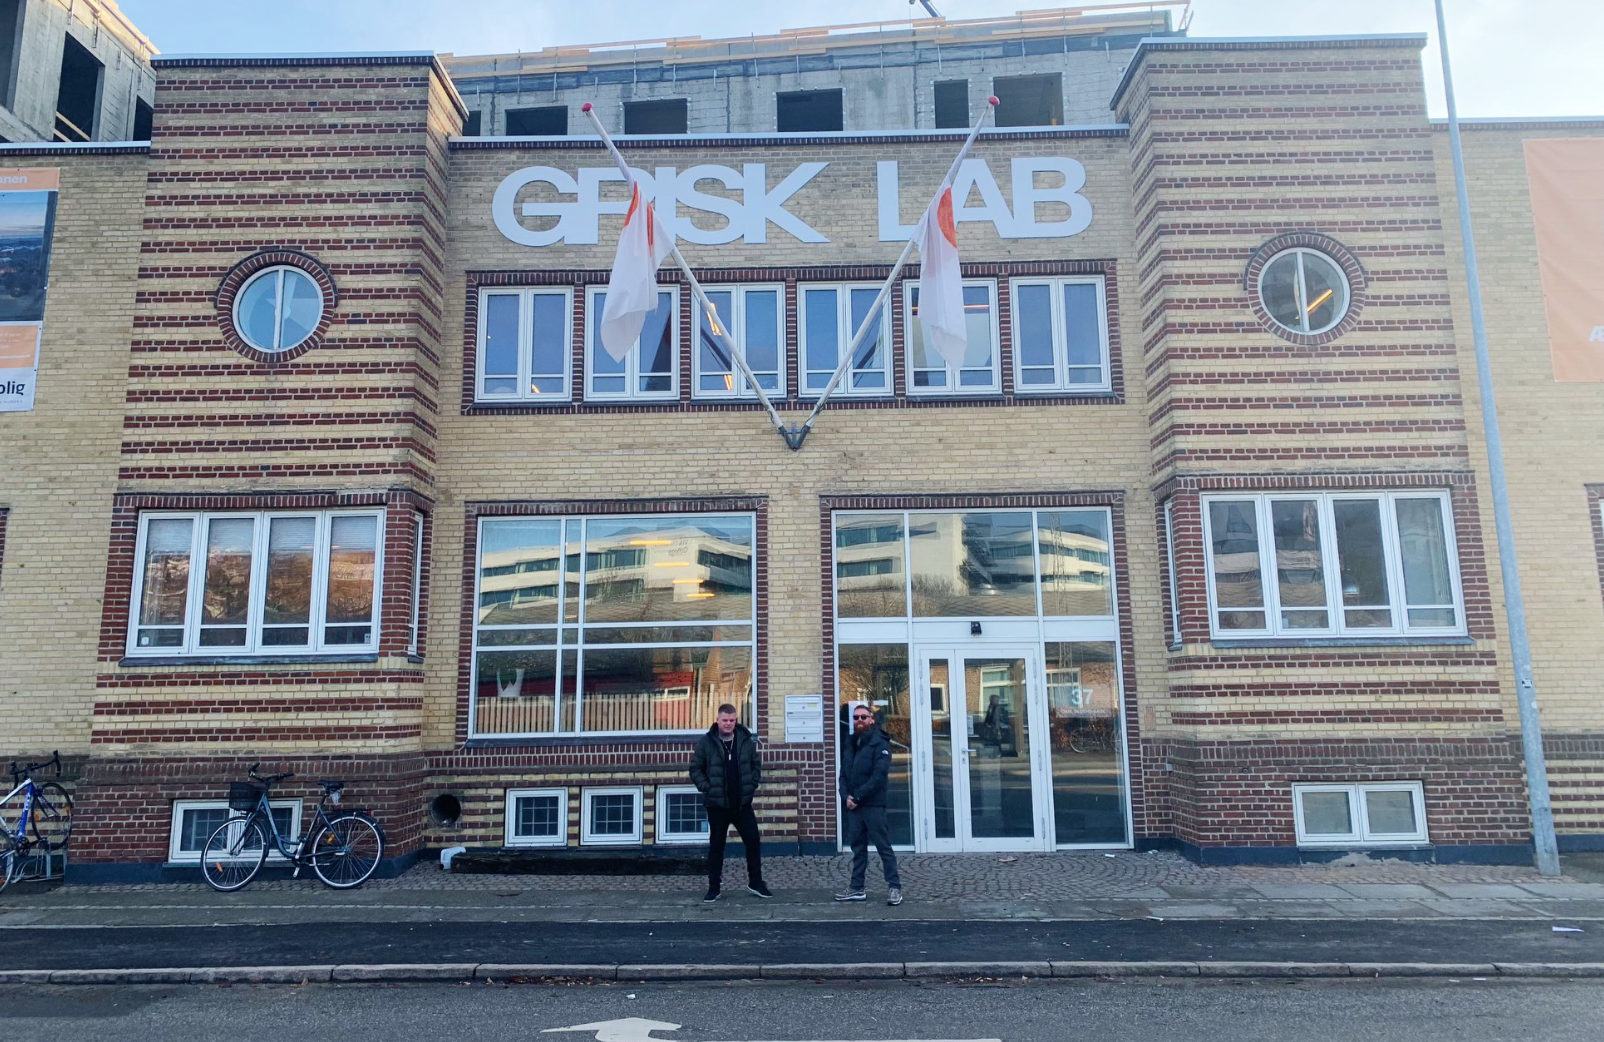 Galleri Grisk, street art, gavlmalerier, street art udsmykning, kunst, galleri i Aarhus